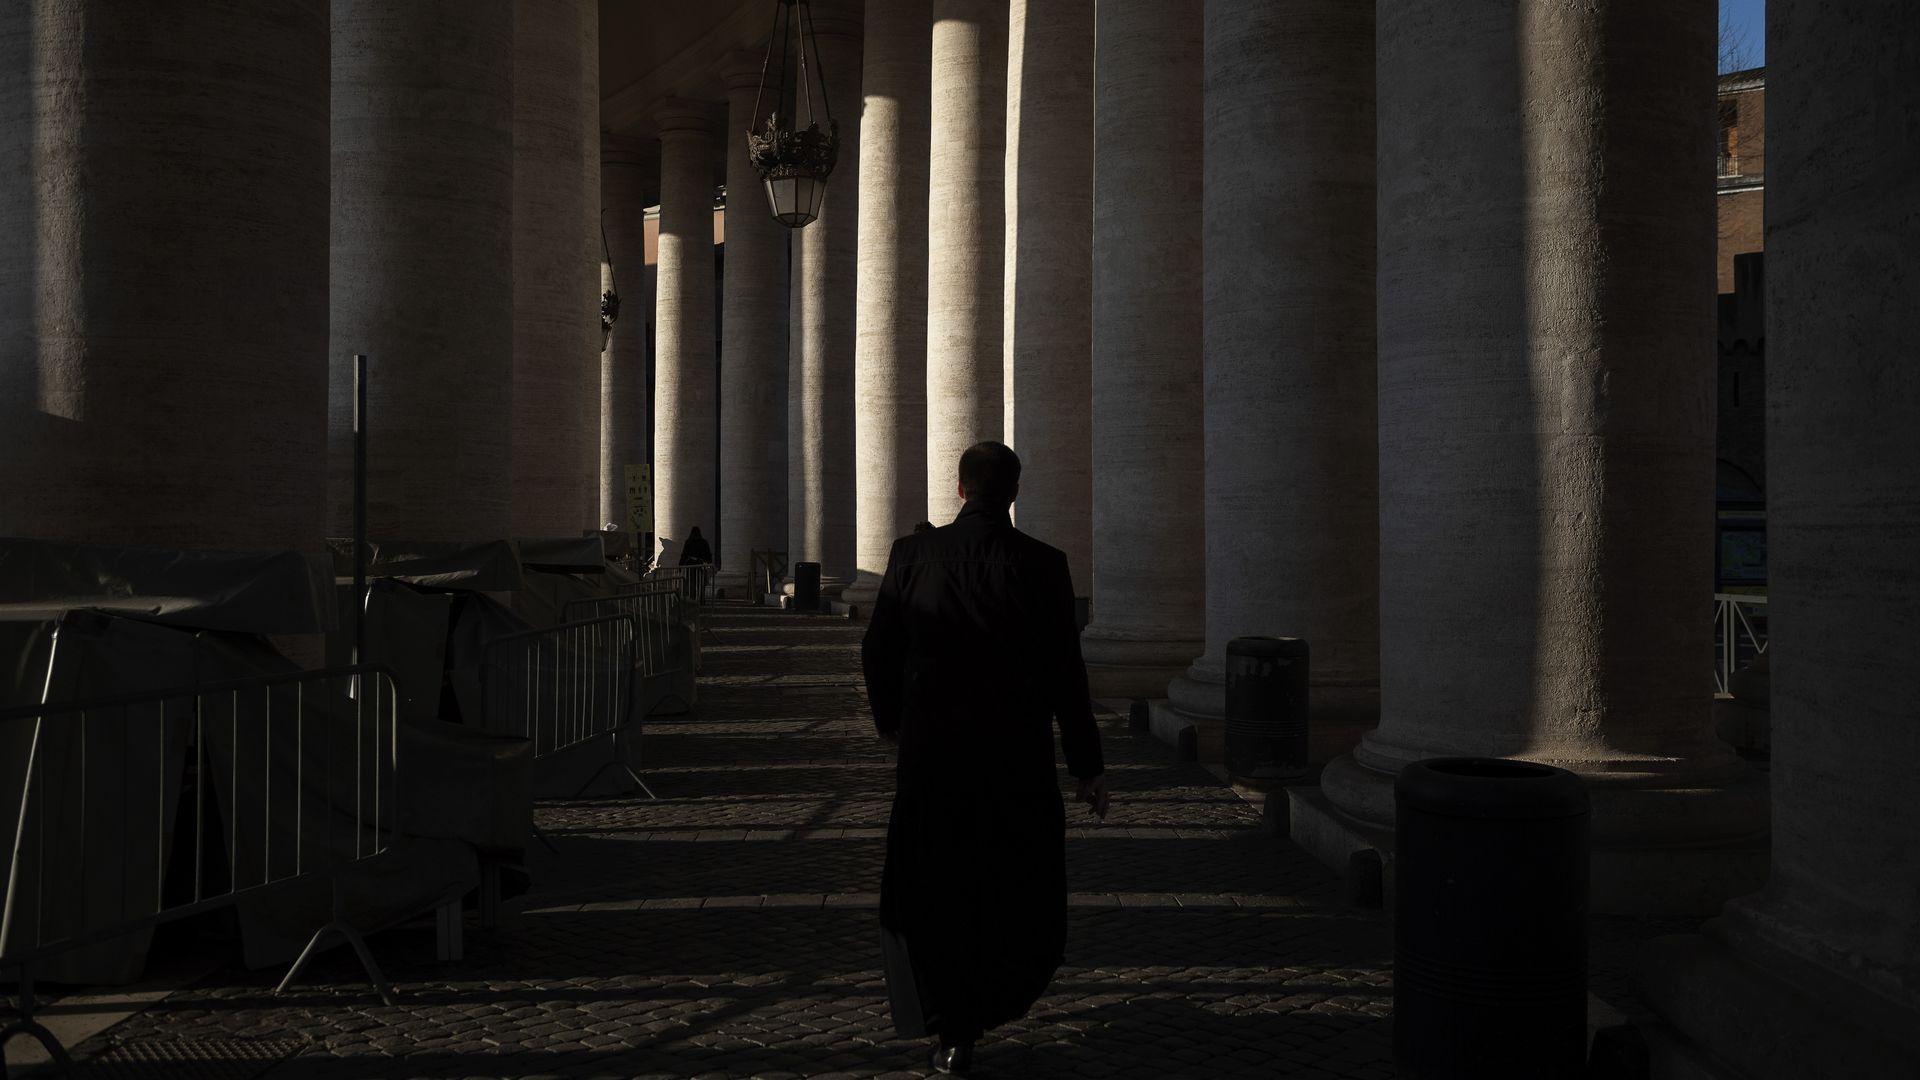 Priest walking in Vatican